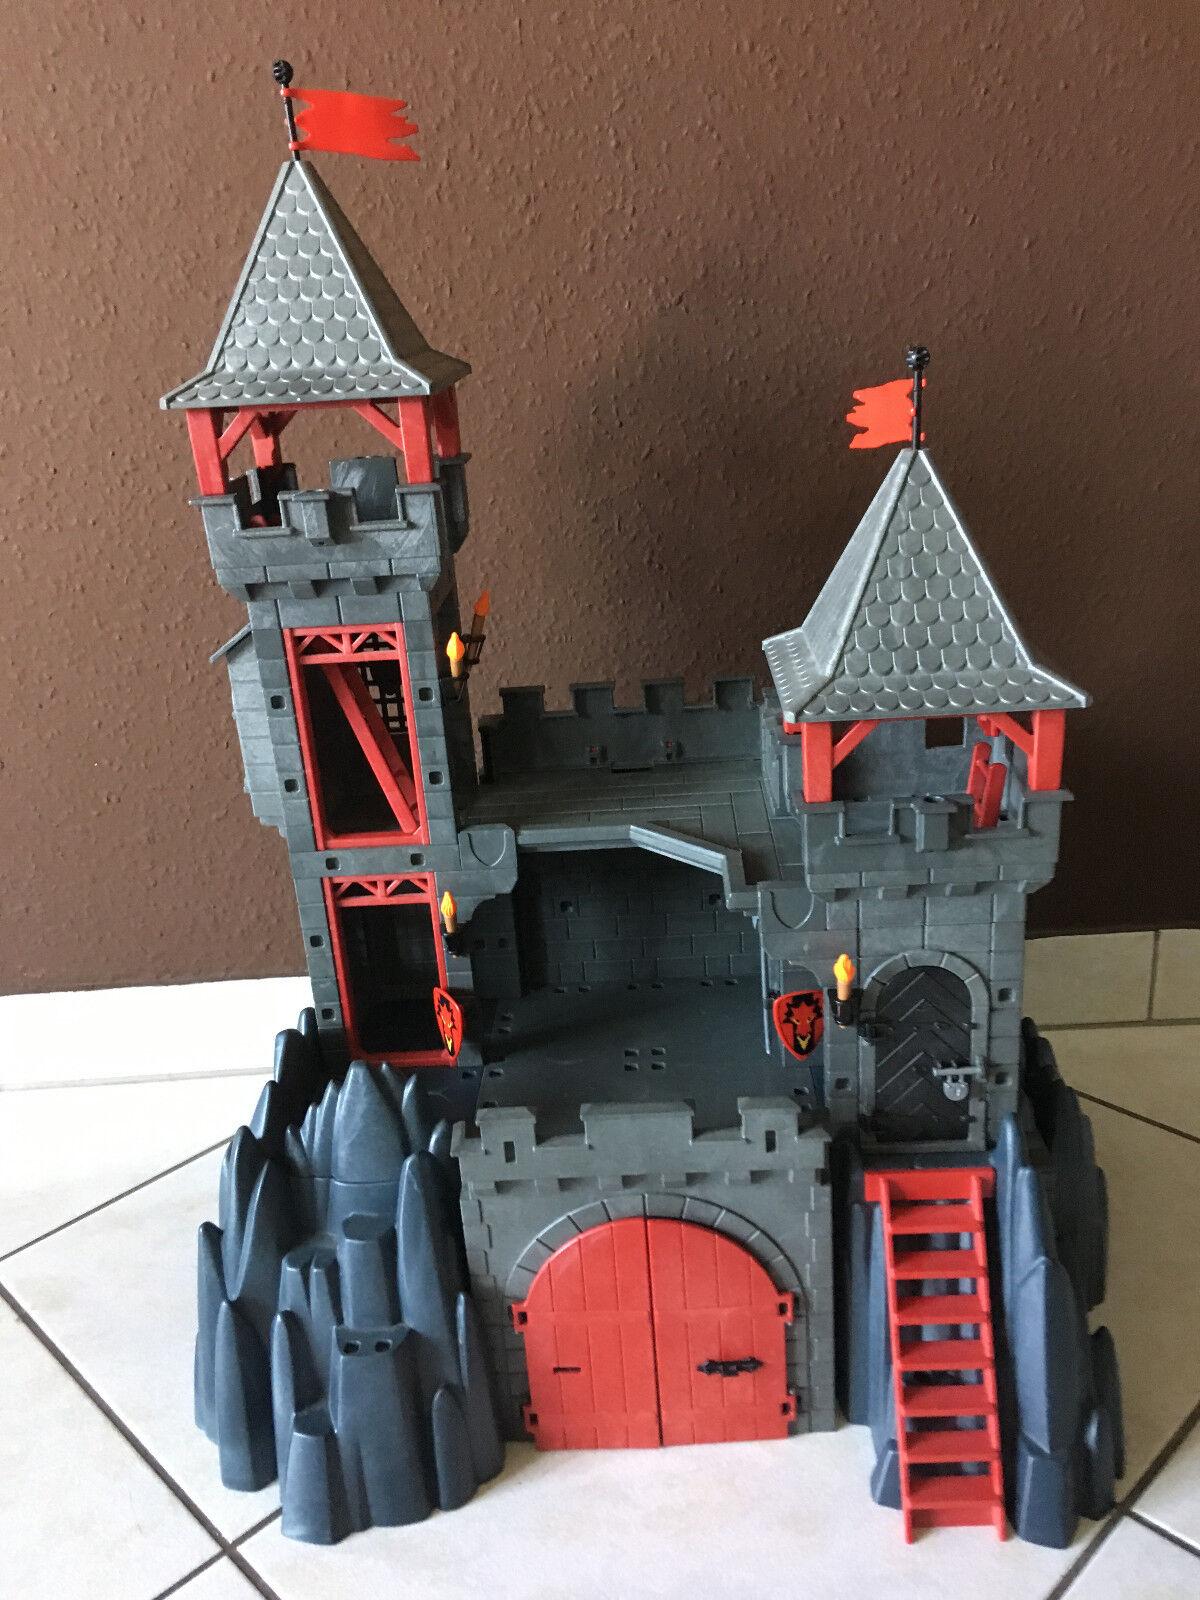 OSTERANGEBOT PLAYMOBIL Drachenritterburg+zusätzlichem Ritterbundle+rotem Drachen